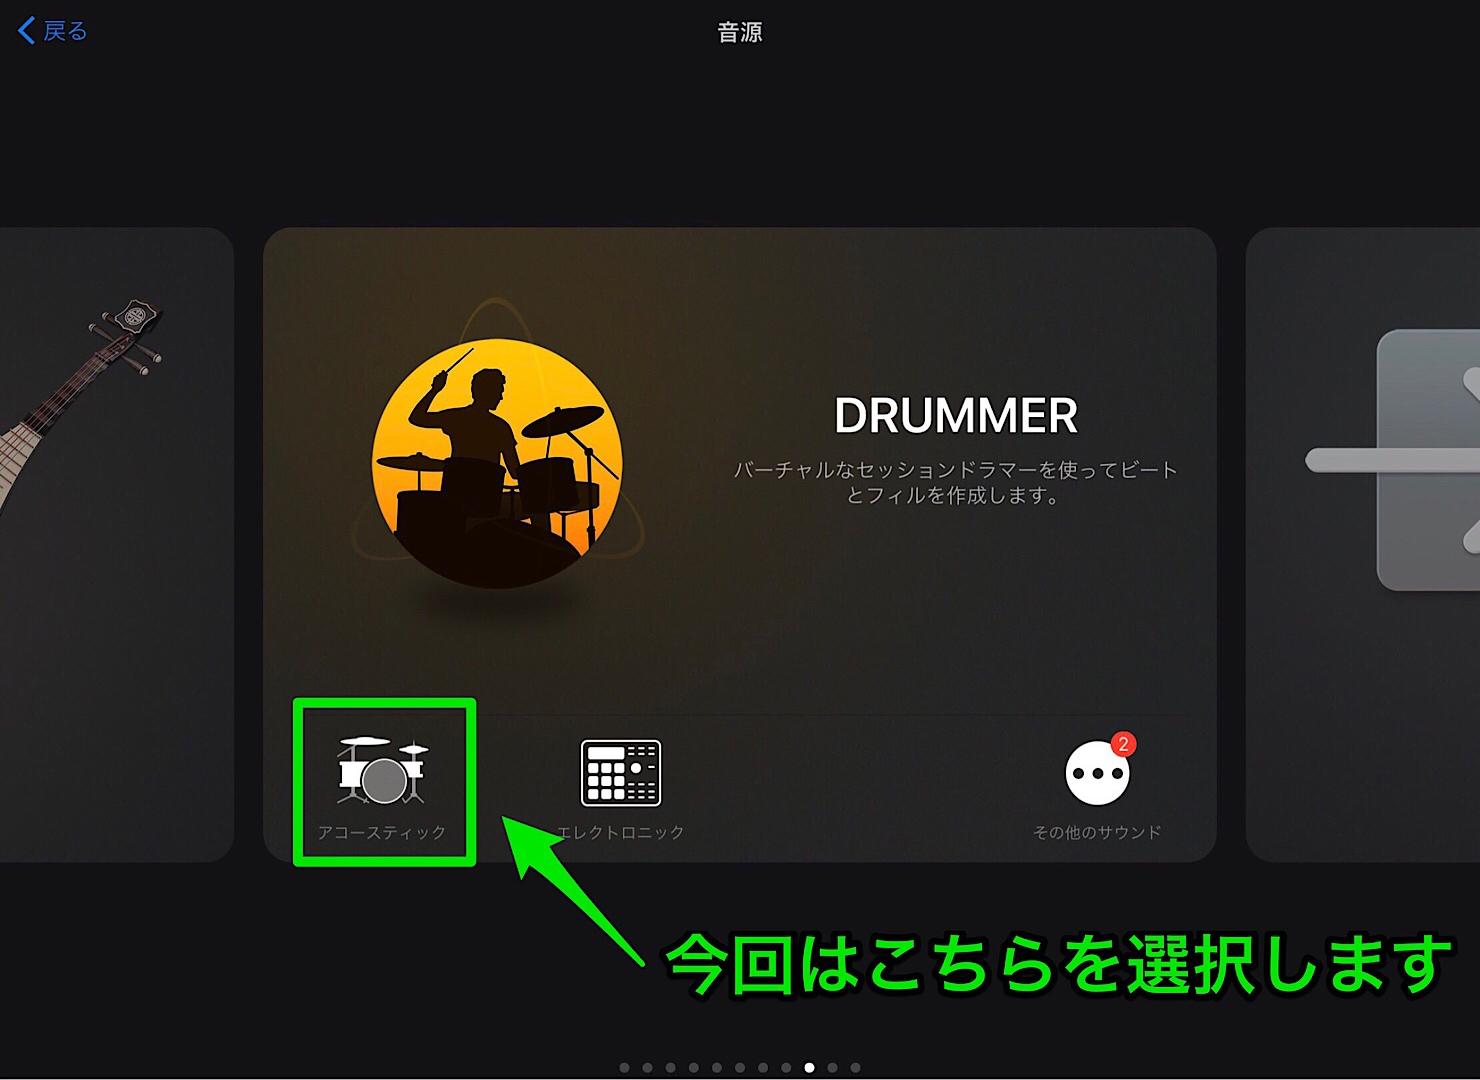 programming-drums-1-2